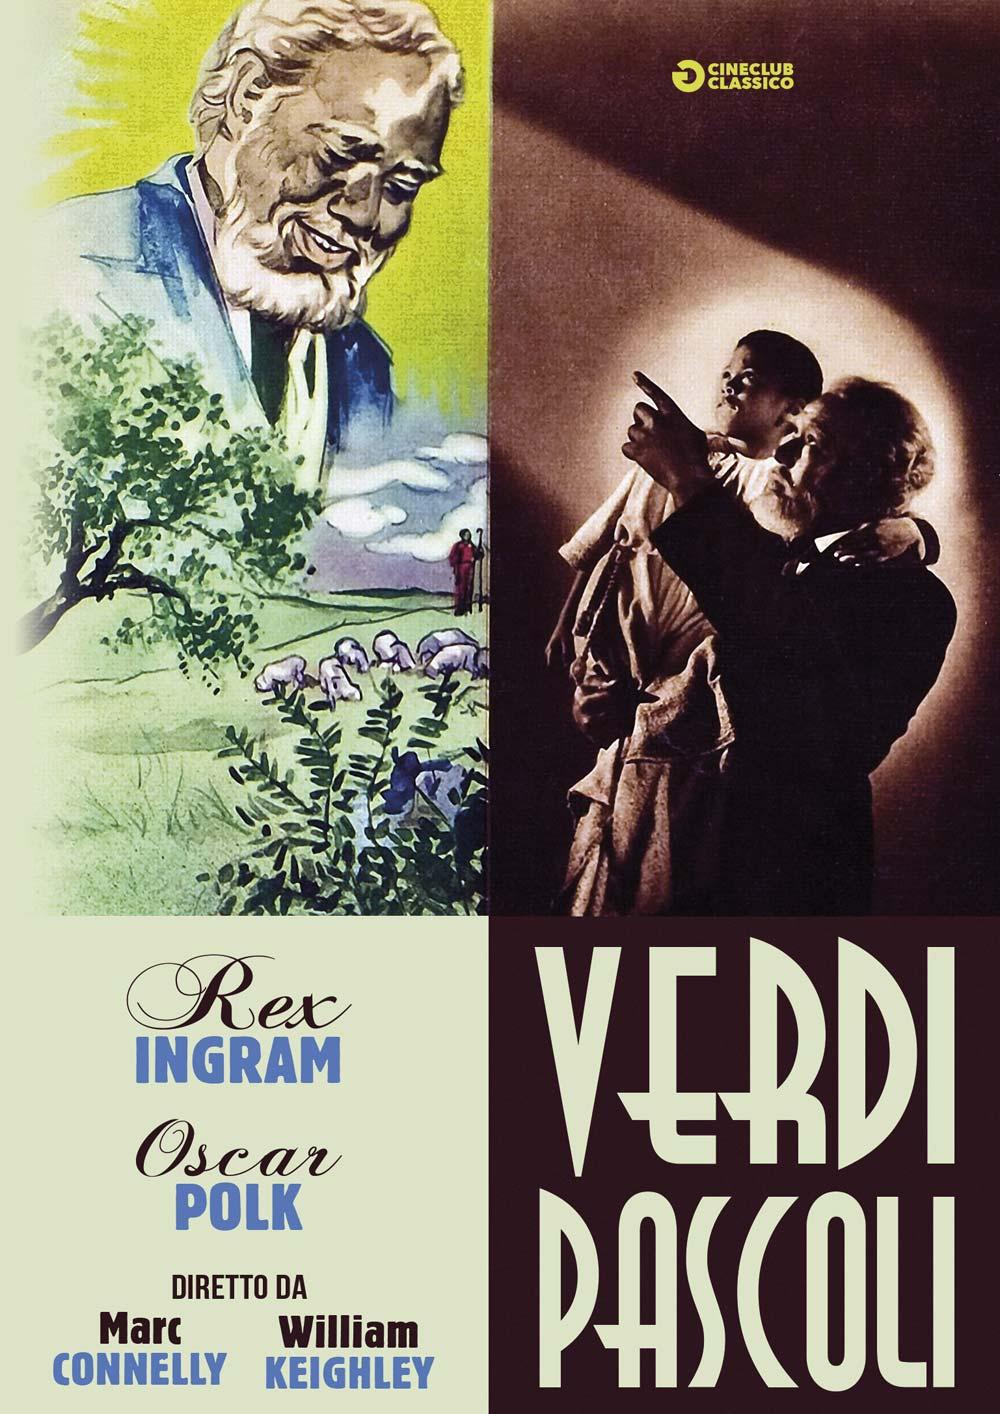 VERDI PASCOLI (DVD)